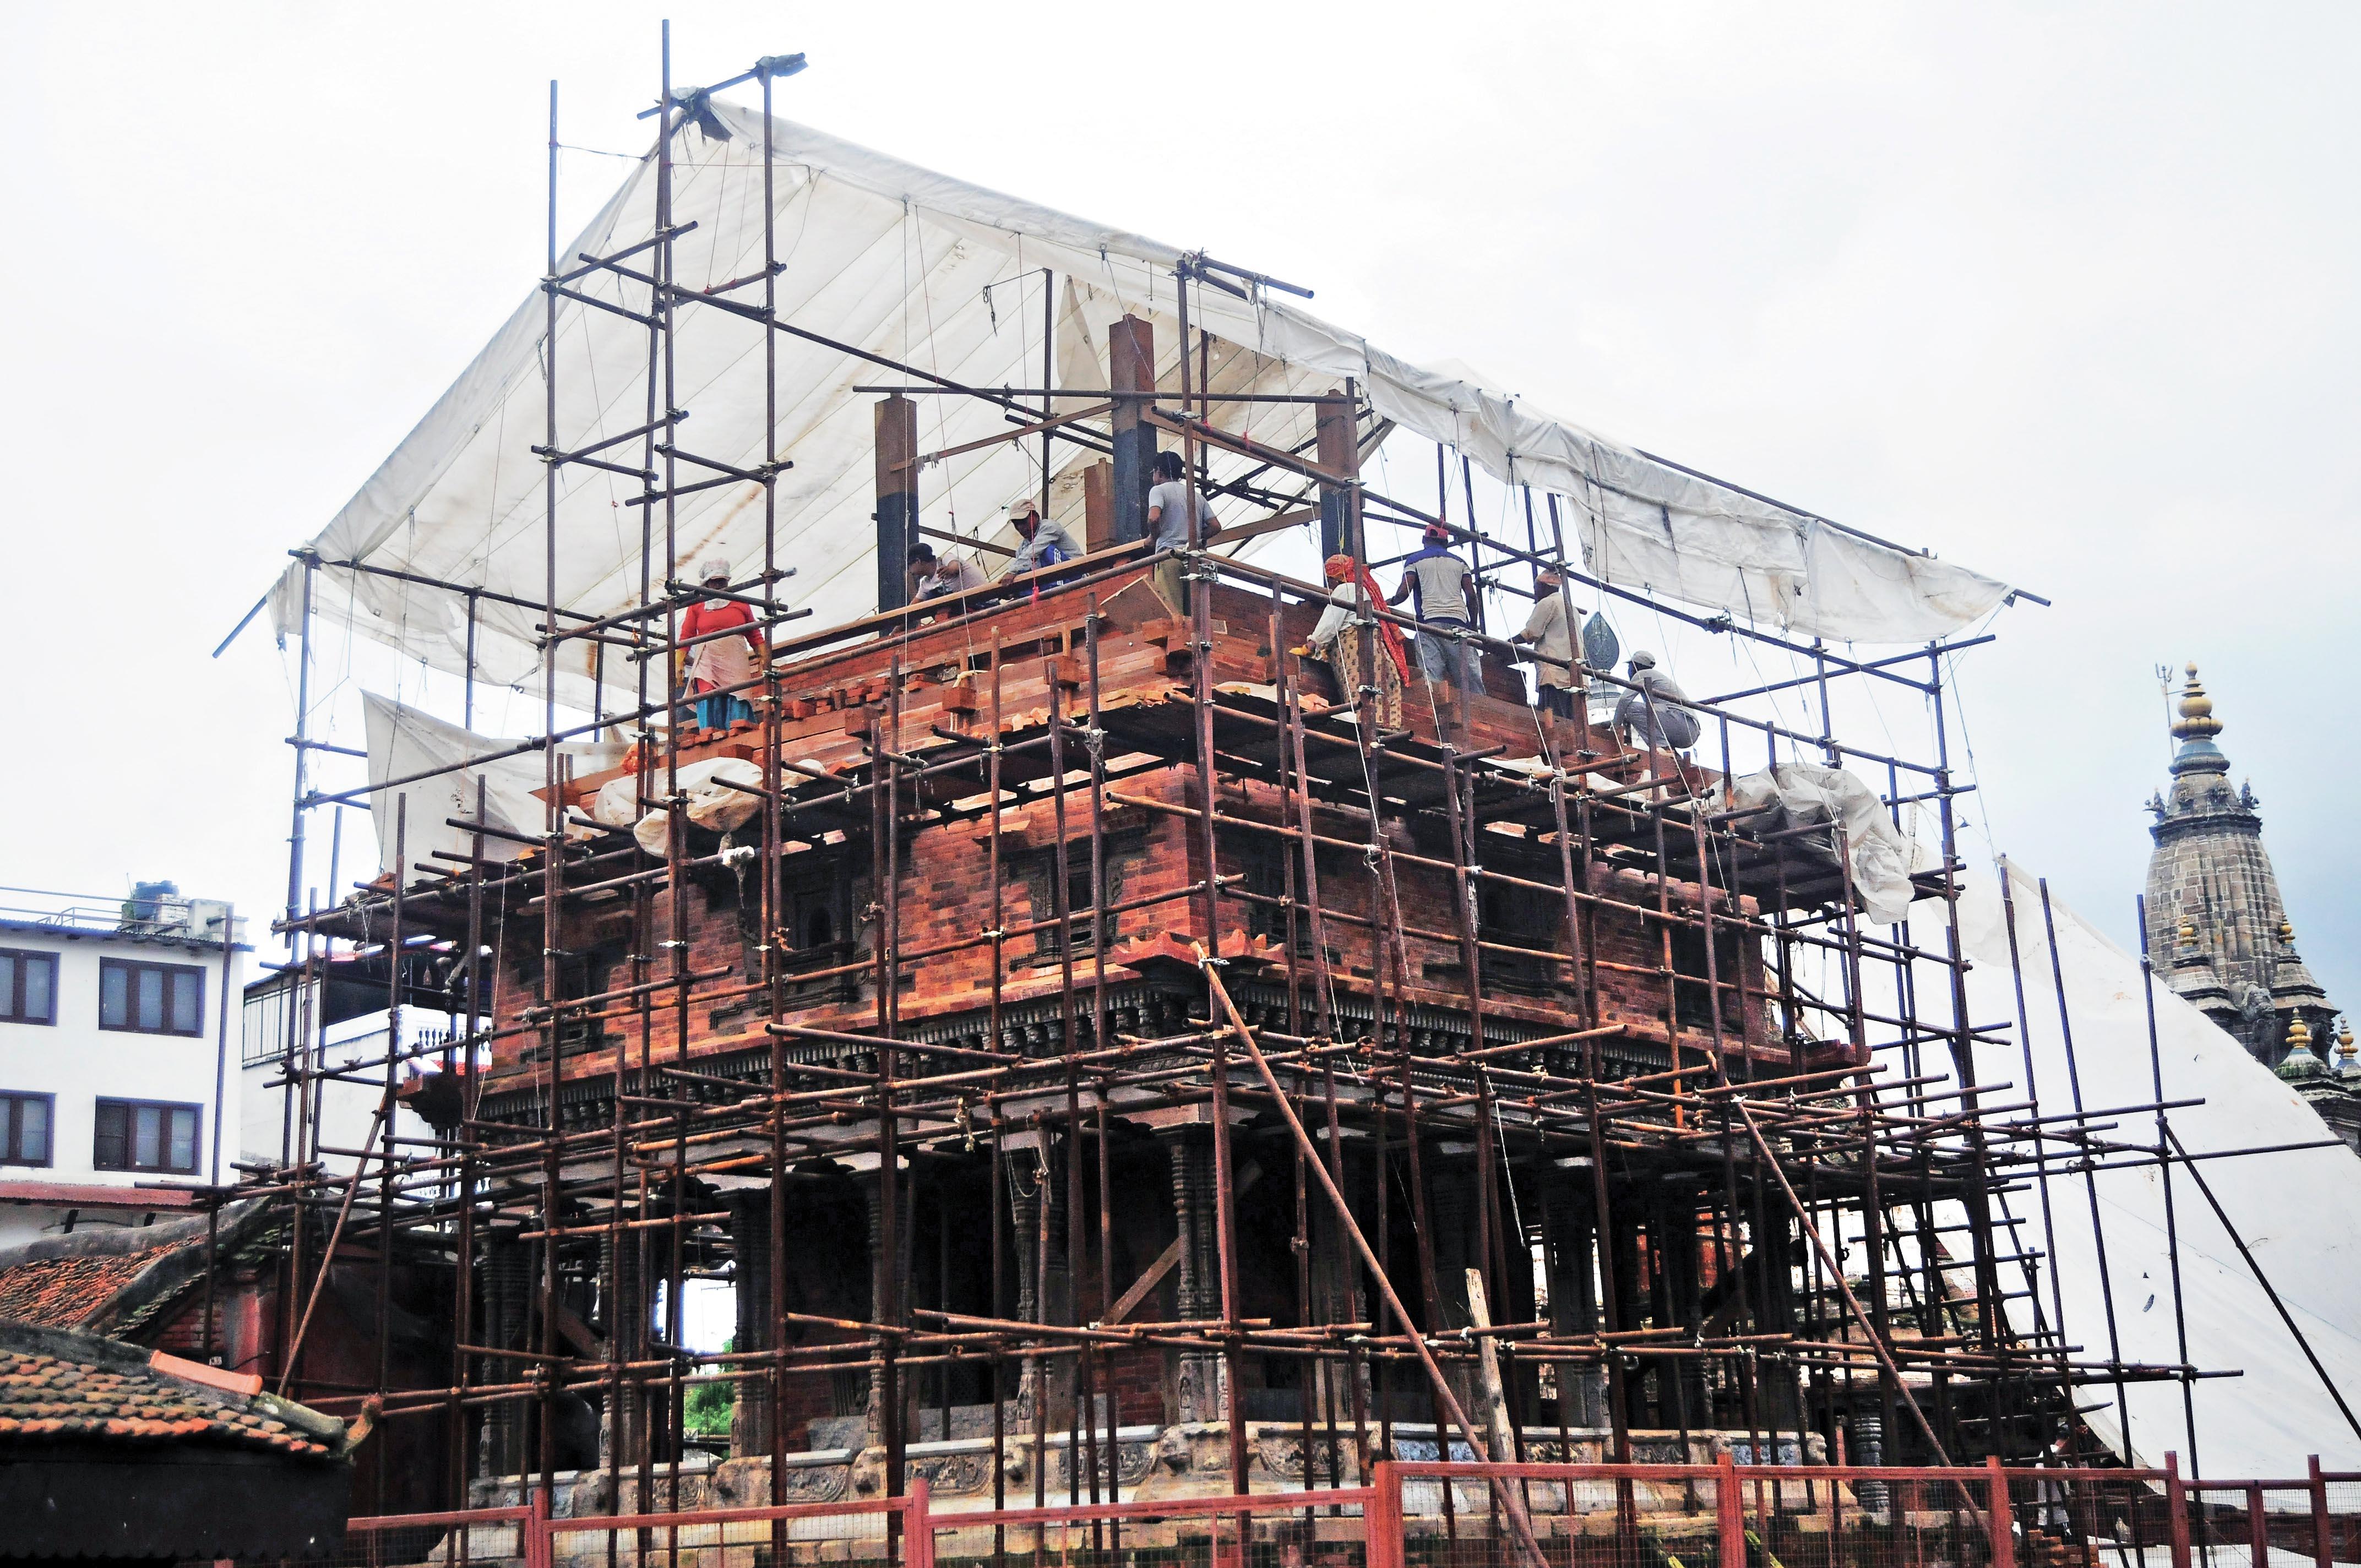 Reconstruction of a temple in progress in Patan Durbar Square, Lalitpur, on Tuesday, September 4, 2018. Photo: Balkrishna Thapa Chhetri/THT